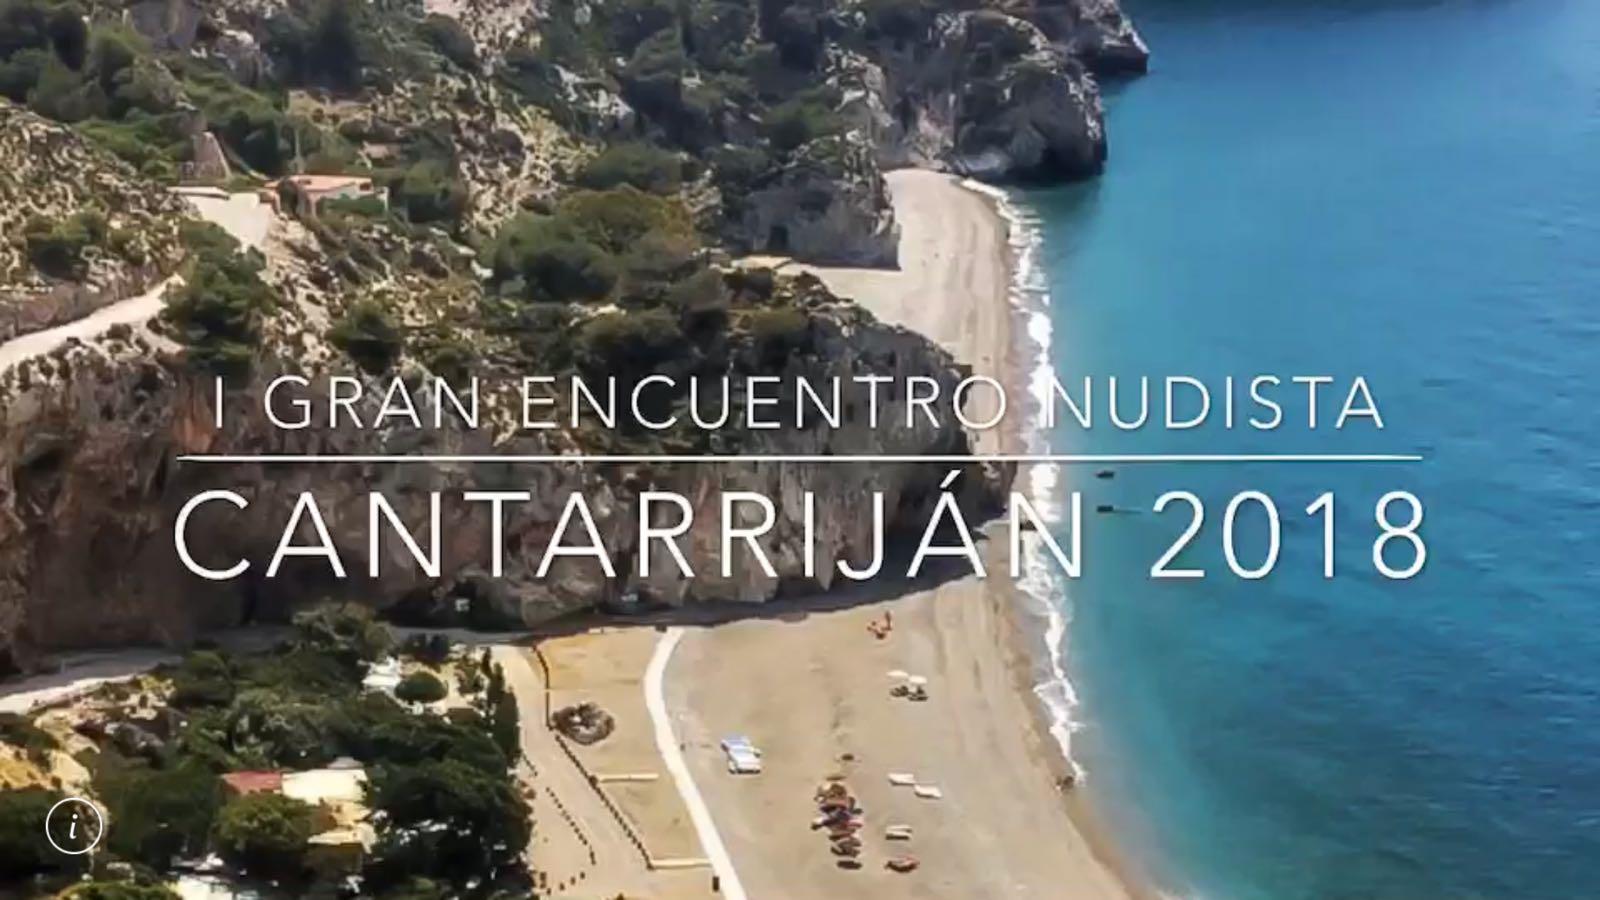 Cantarriján 2018 encuentro naturista